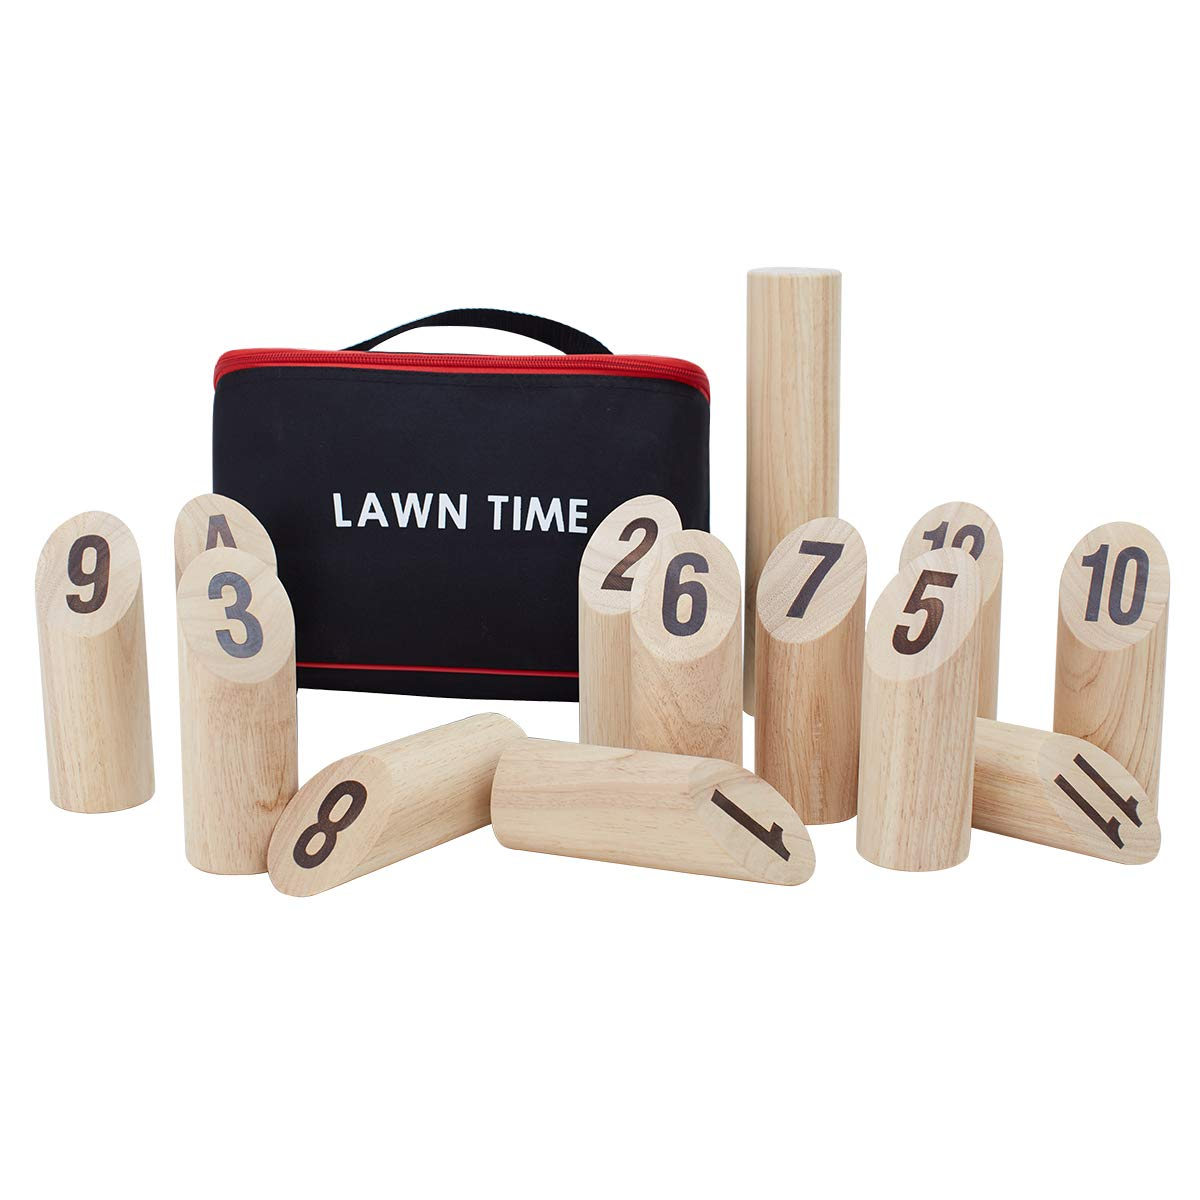 LAWN TIME Viking Bowling - Molkky - Rubberwood Viking Kubb with Carrying Bag